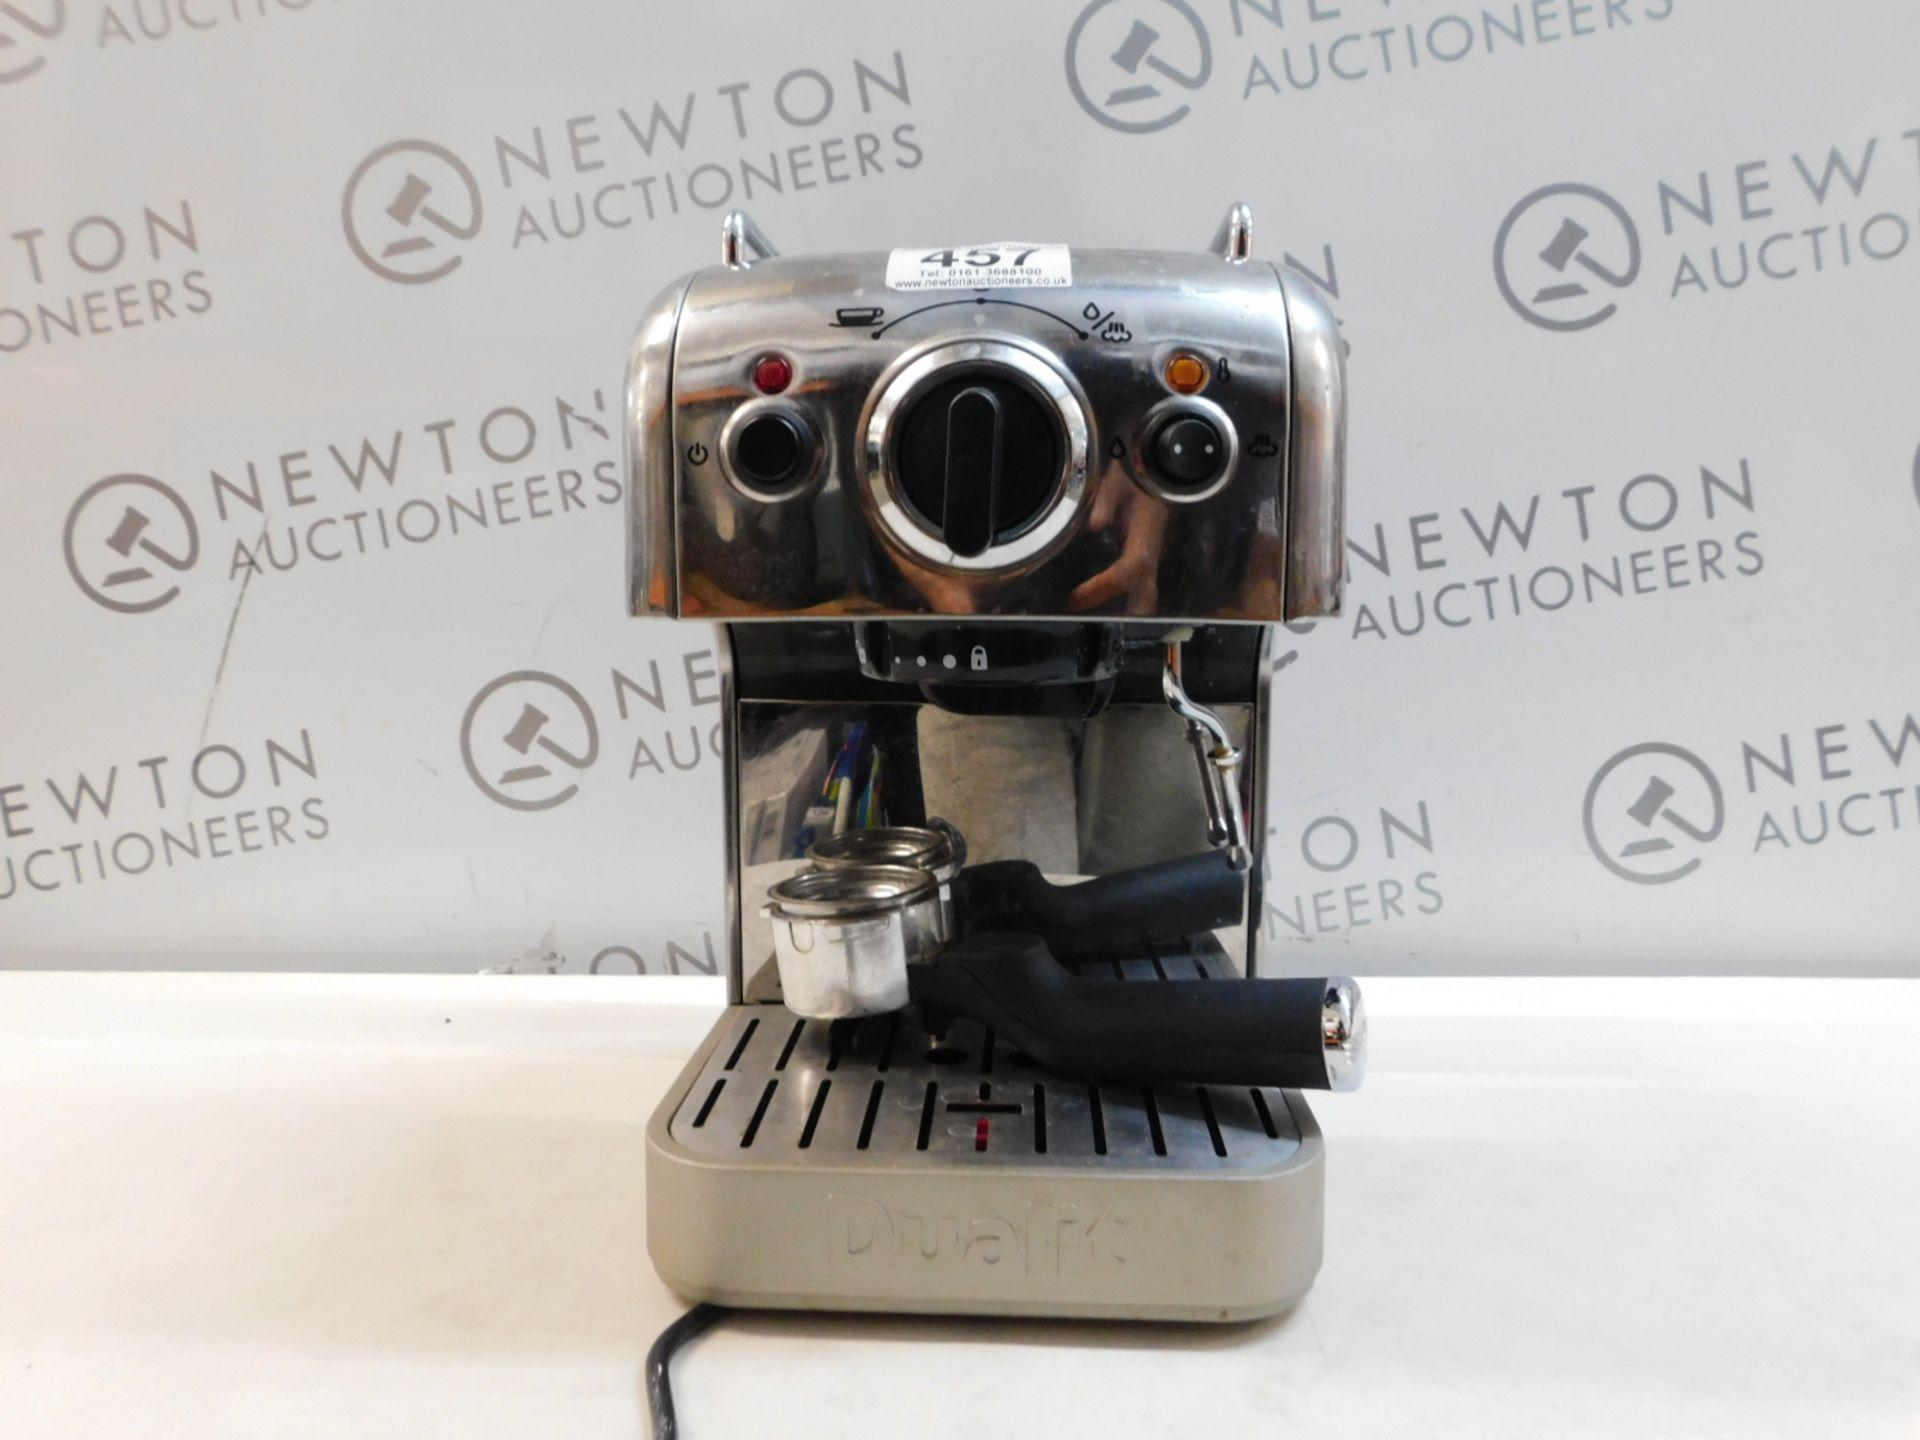 1 DUALIT DCM2X 3-IN-1 COFFEE MACHINE RRP £199